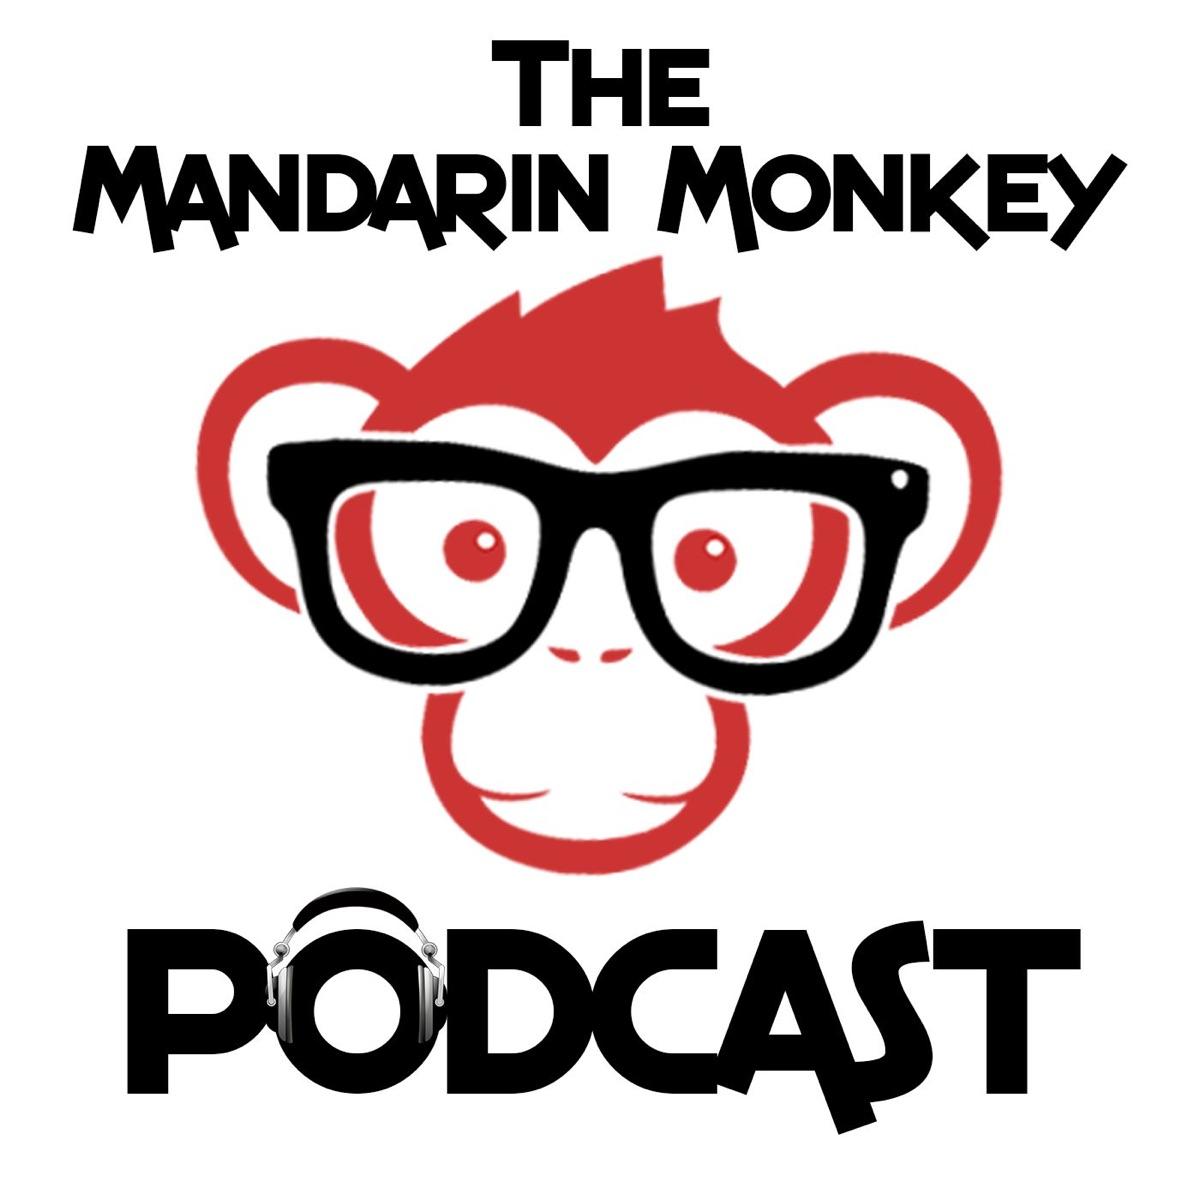 The Mandarin Monkey